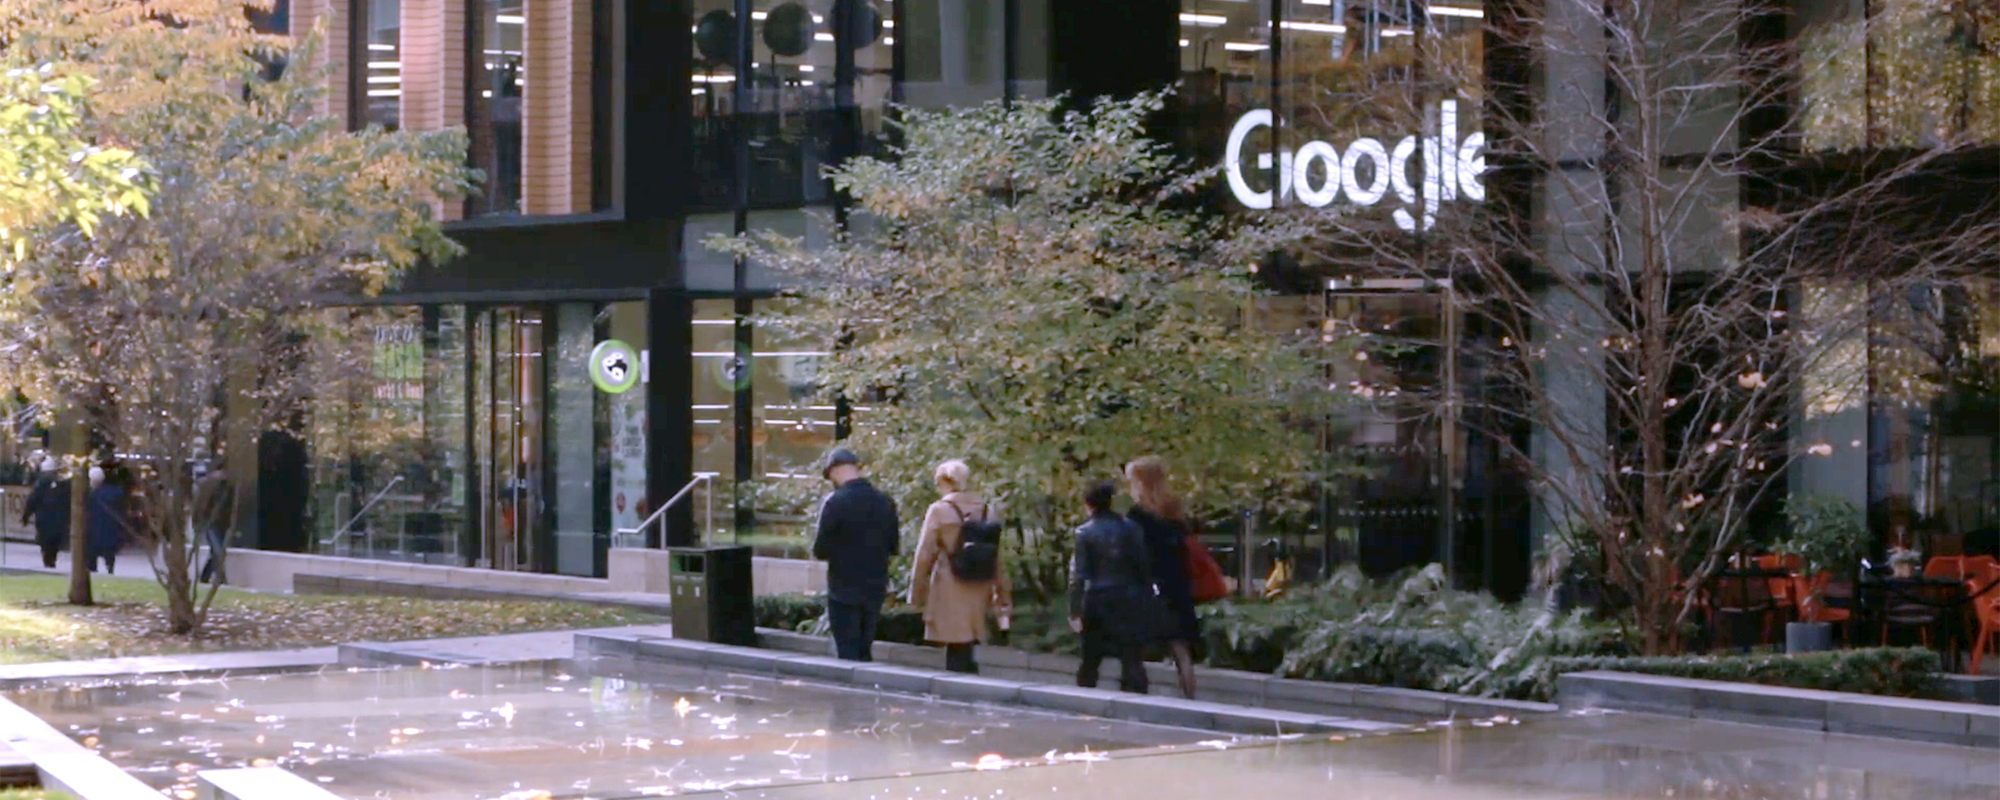 Google UK offices in Kings Cross